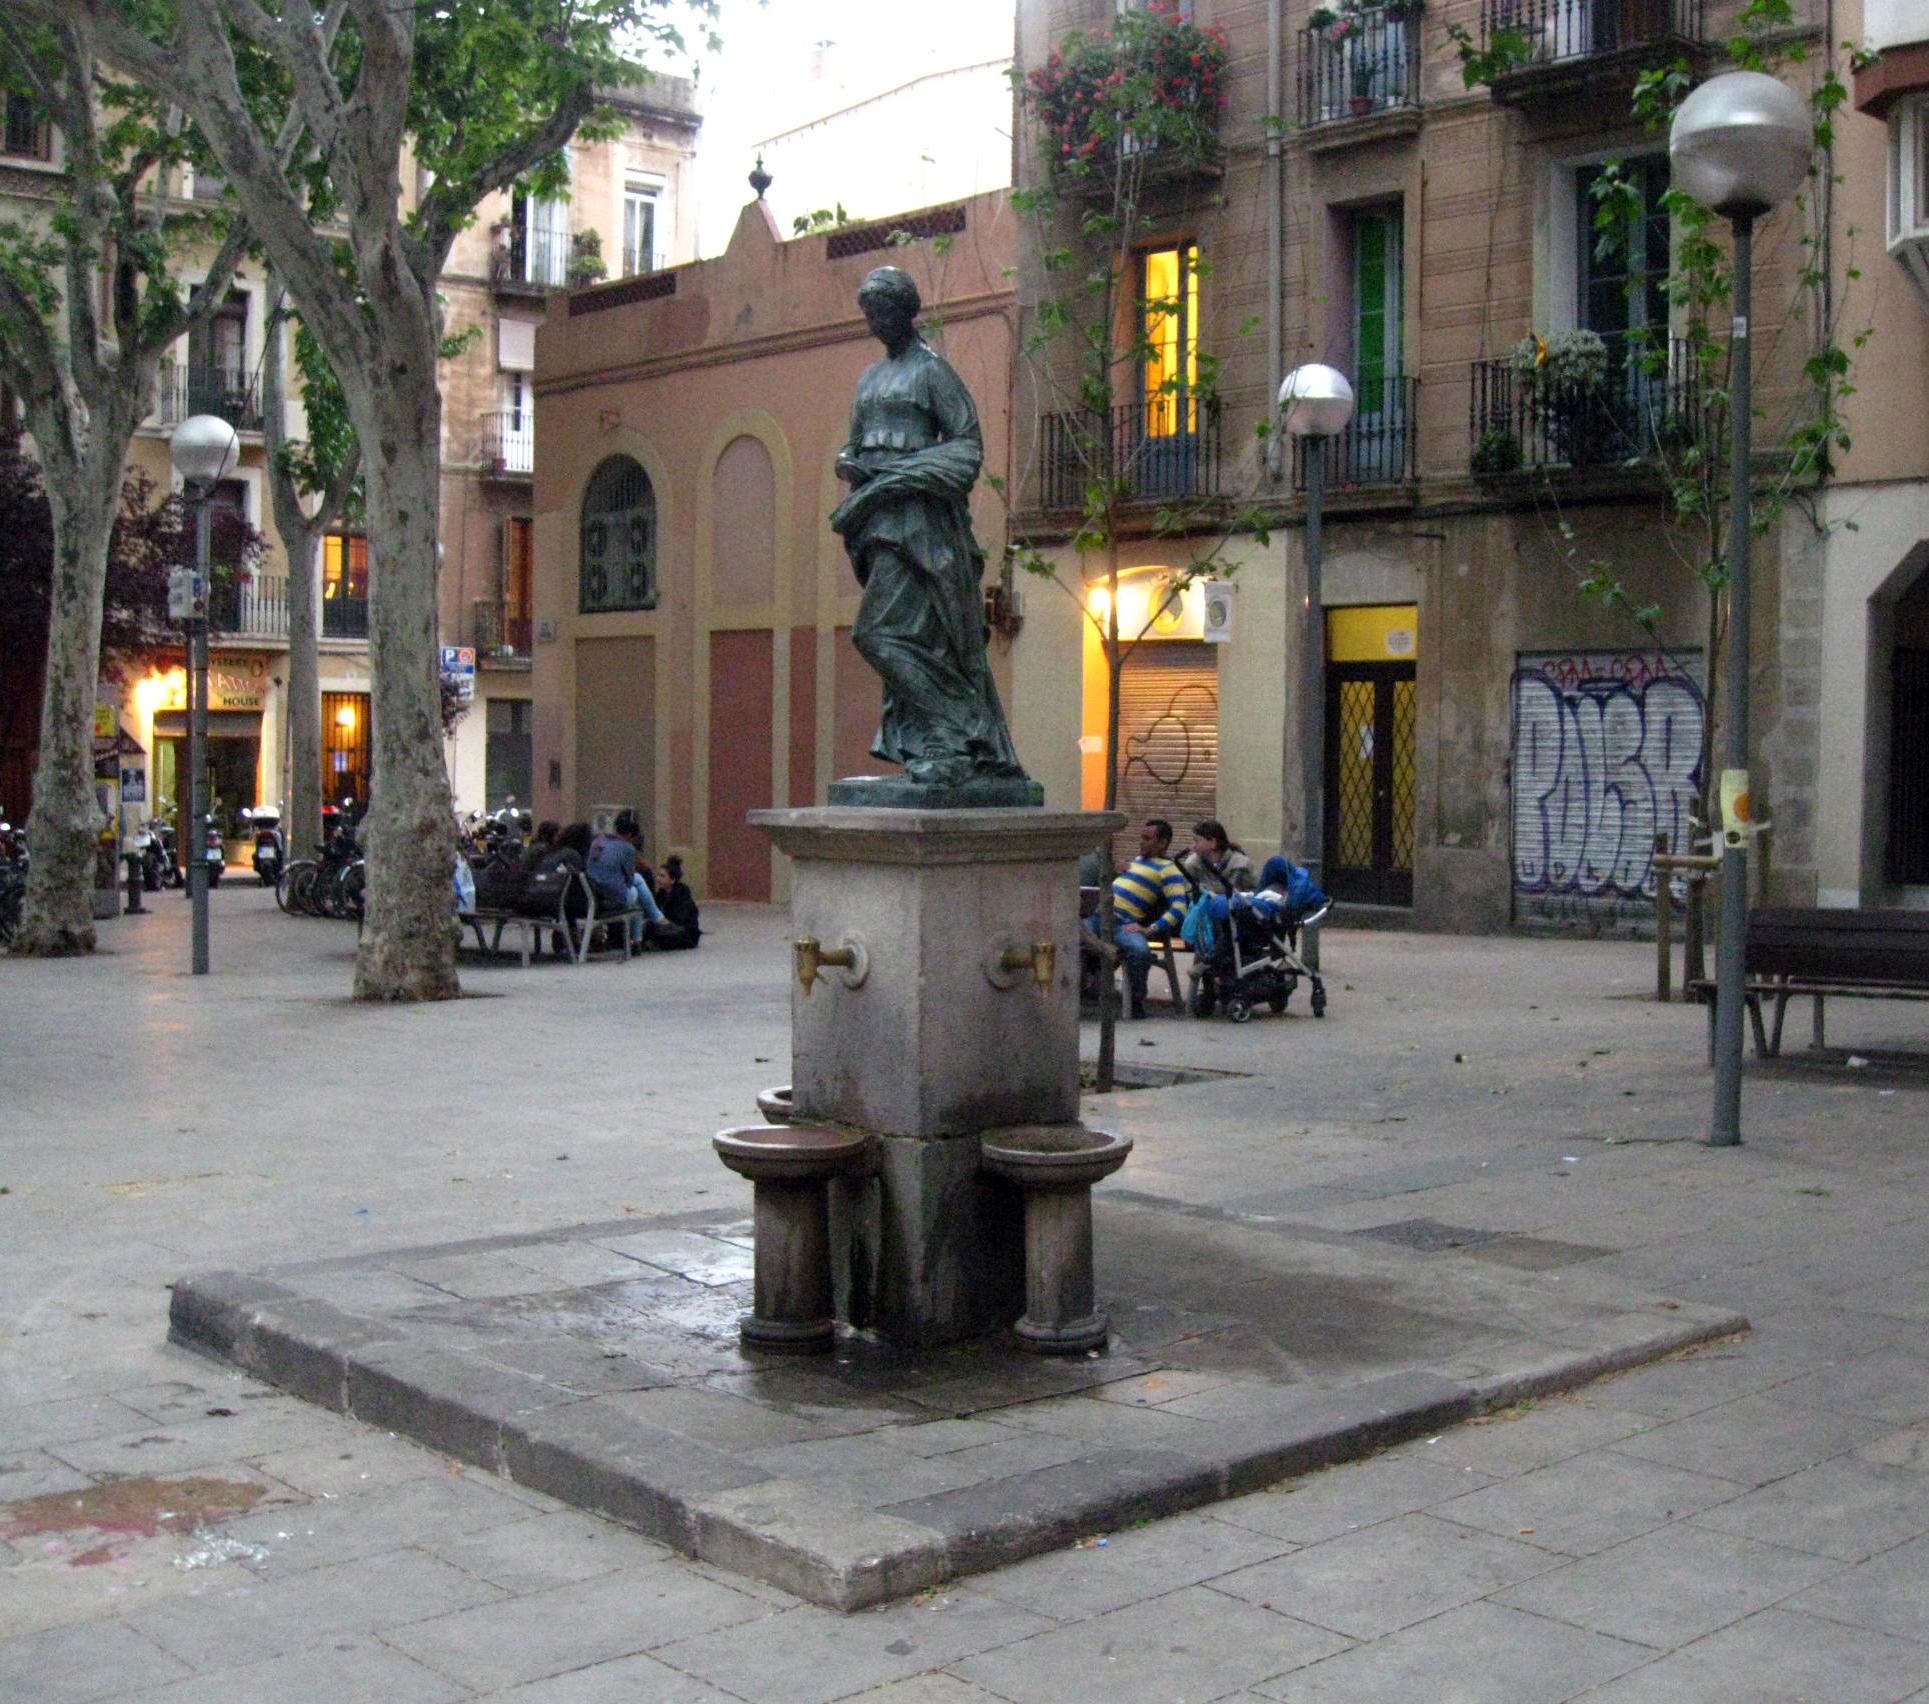 https://upload.wikimedia.org/wikipedia/commons/c/cc/98_Font_de_Rut,_pl._de_la_Virreina.jpg